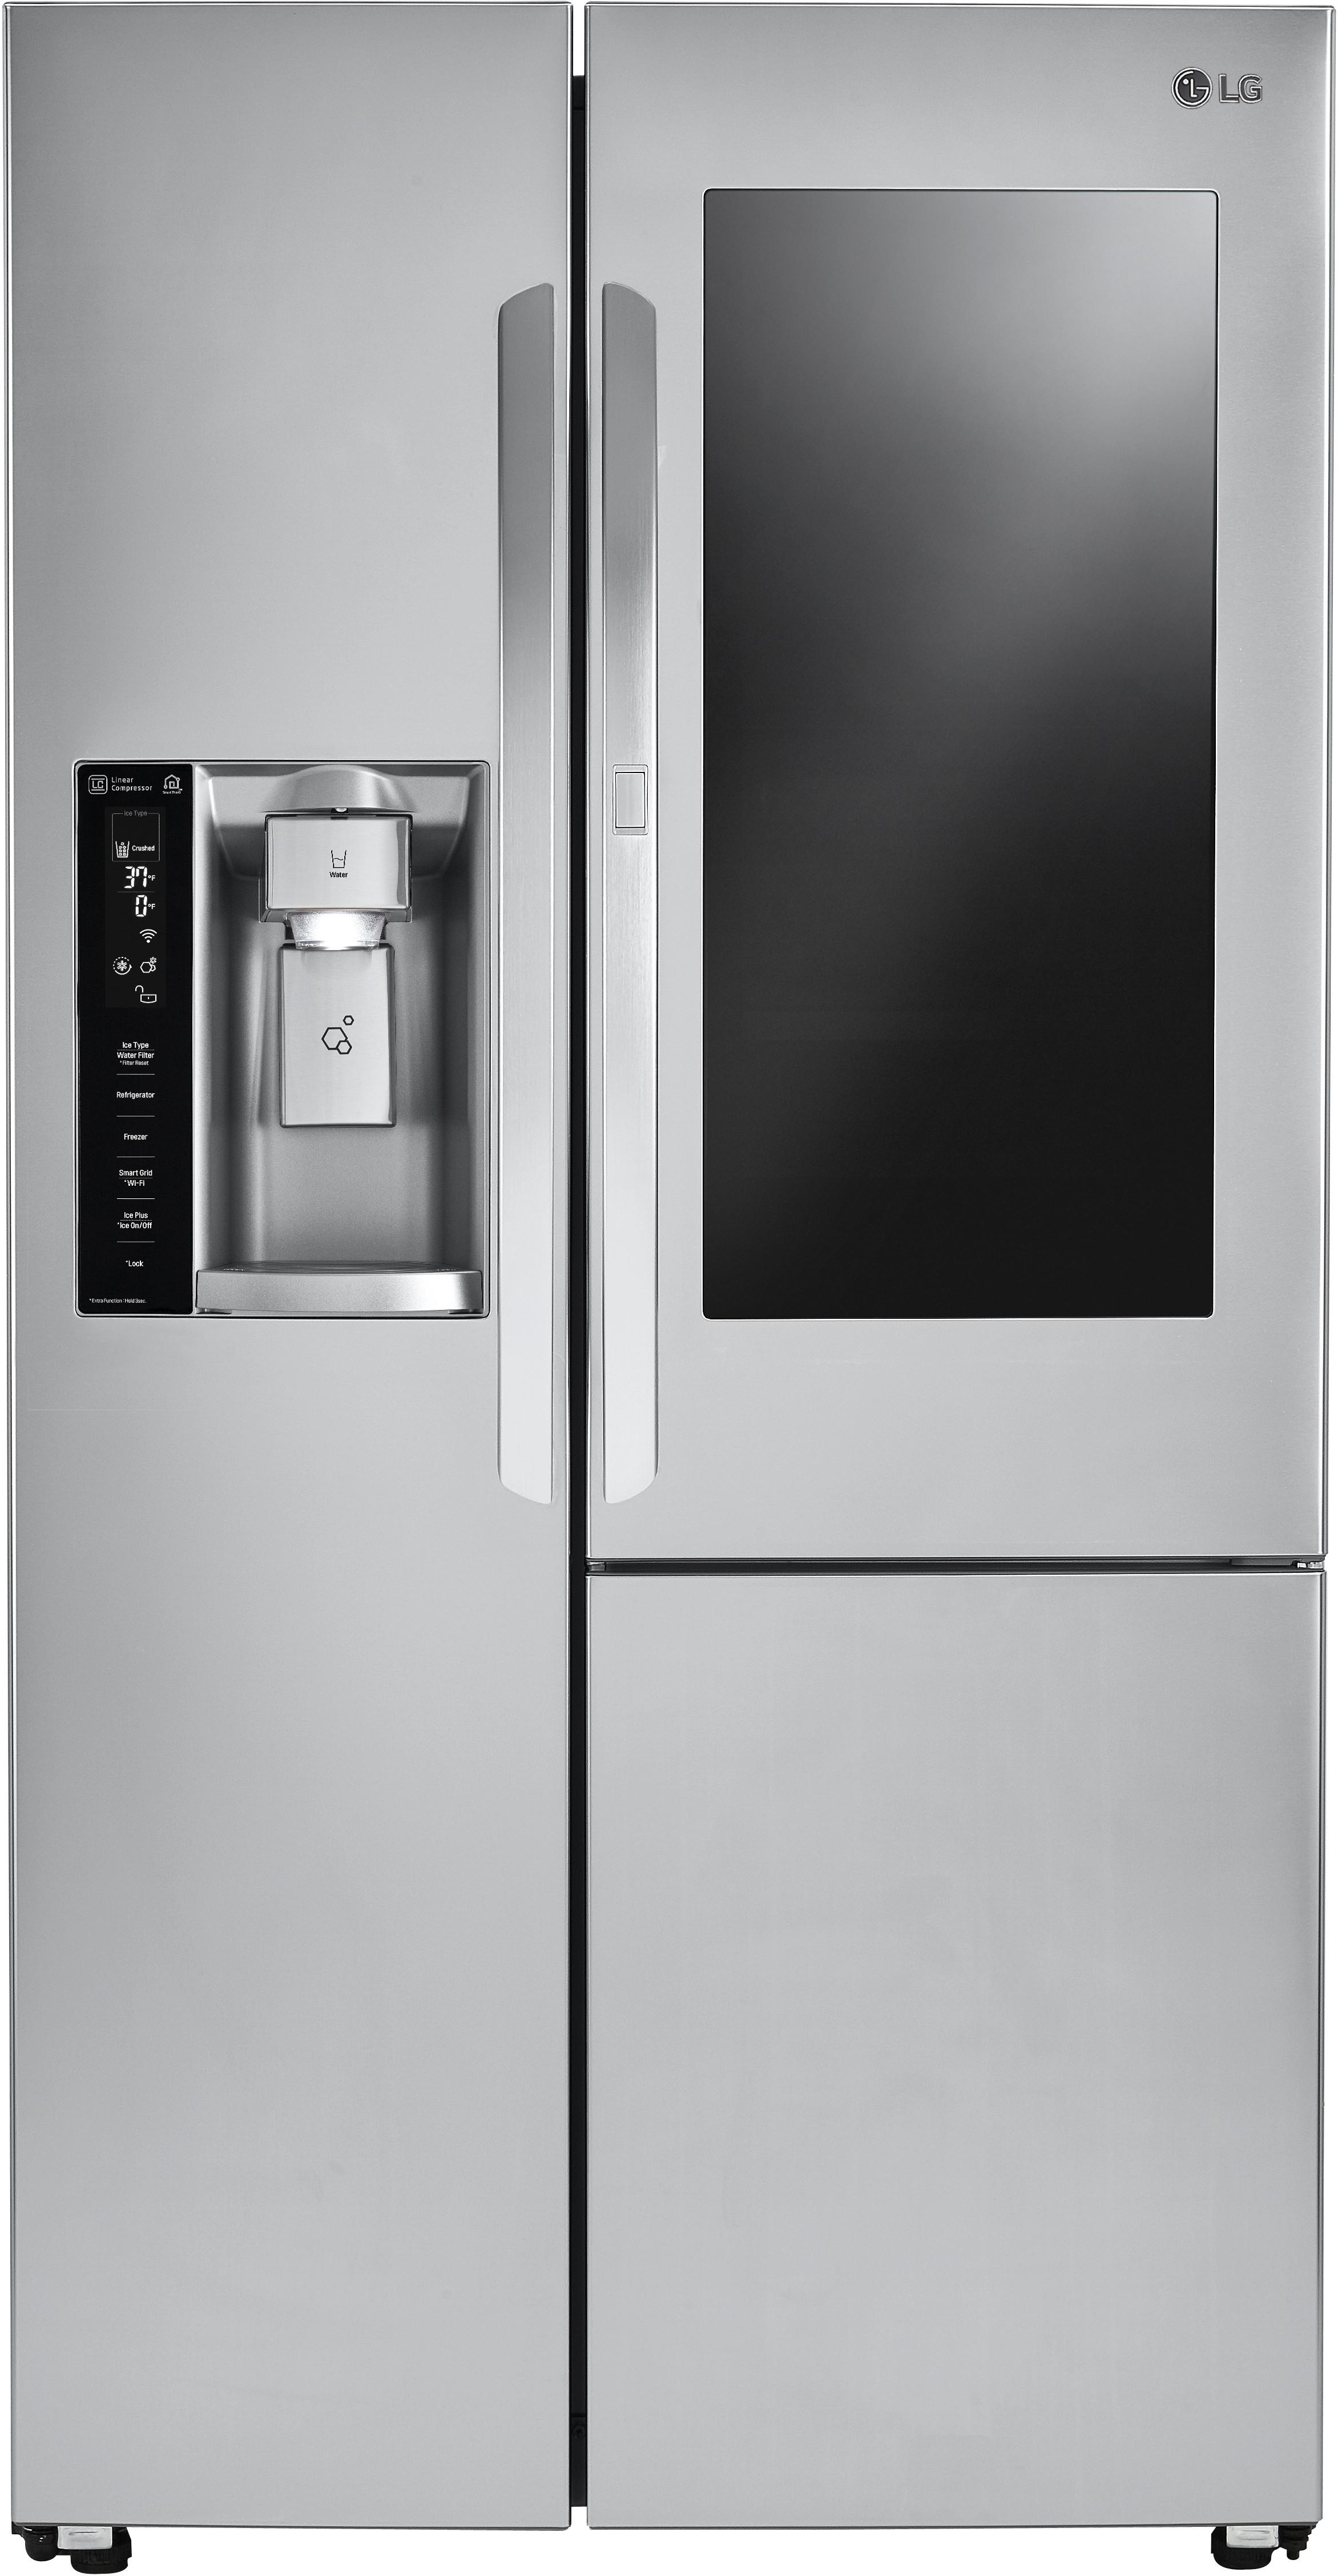 Frosted Glass Door Refrigerator